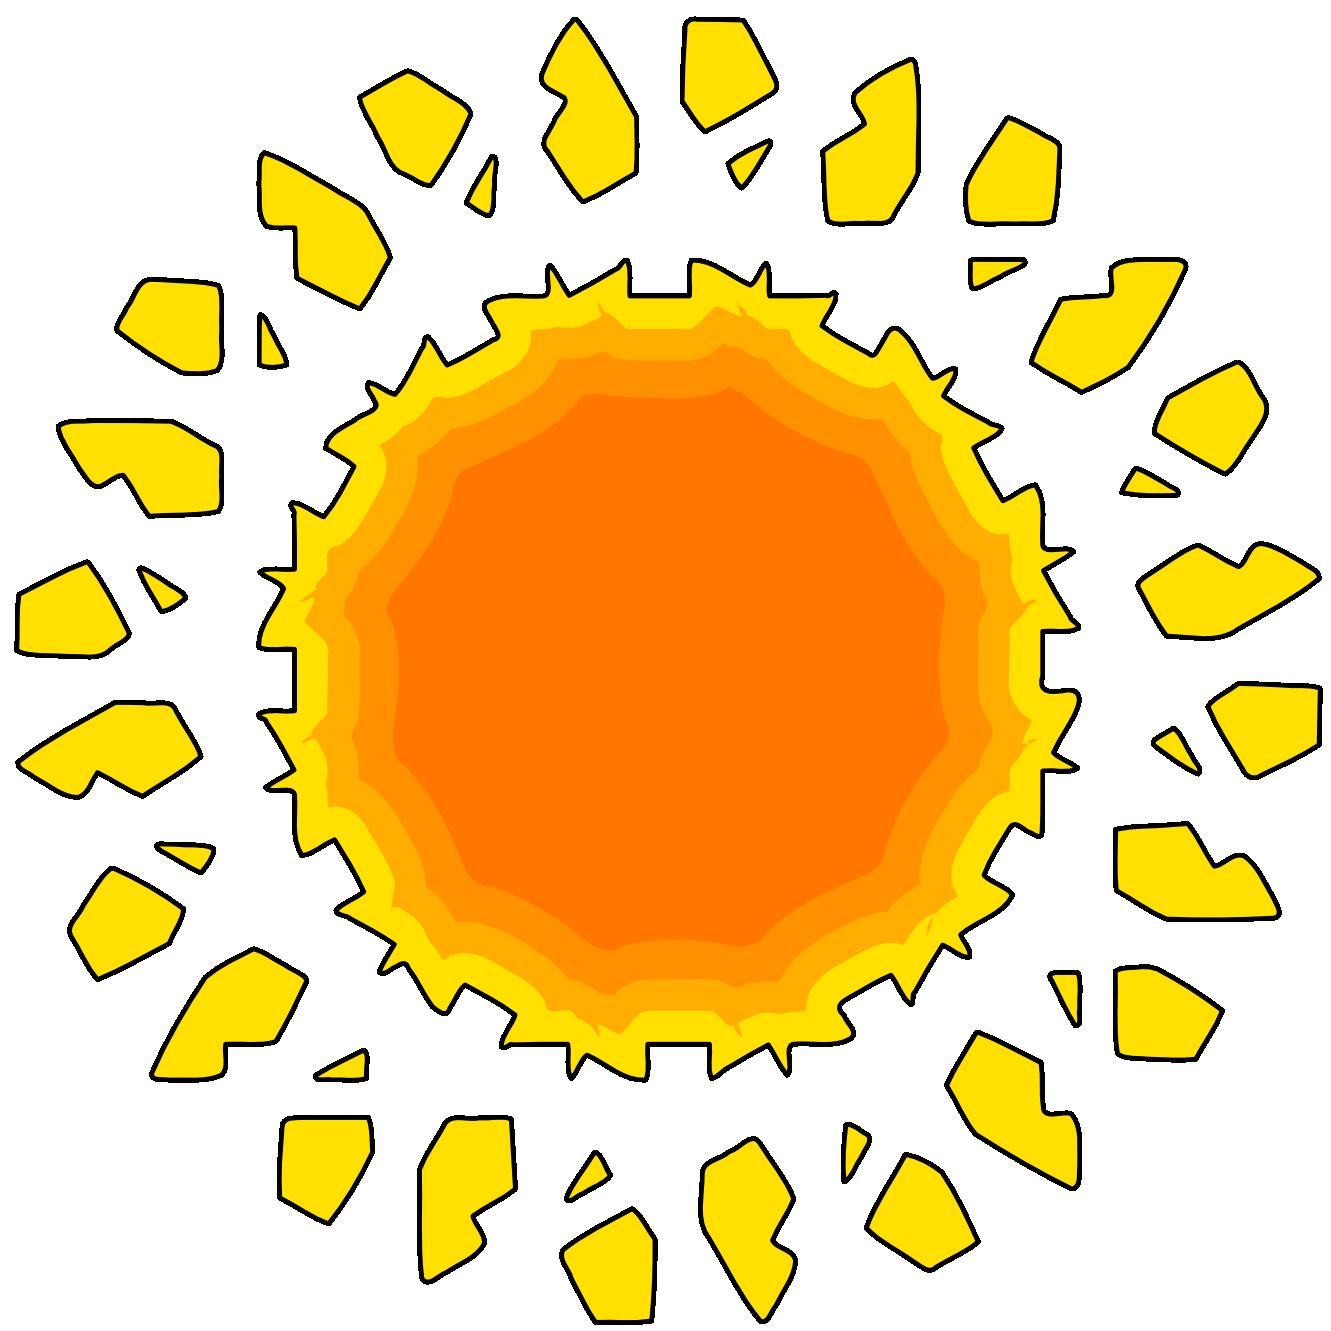 Sun jokingart com sunshine. Sunny clipart field background